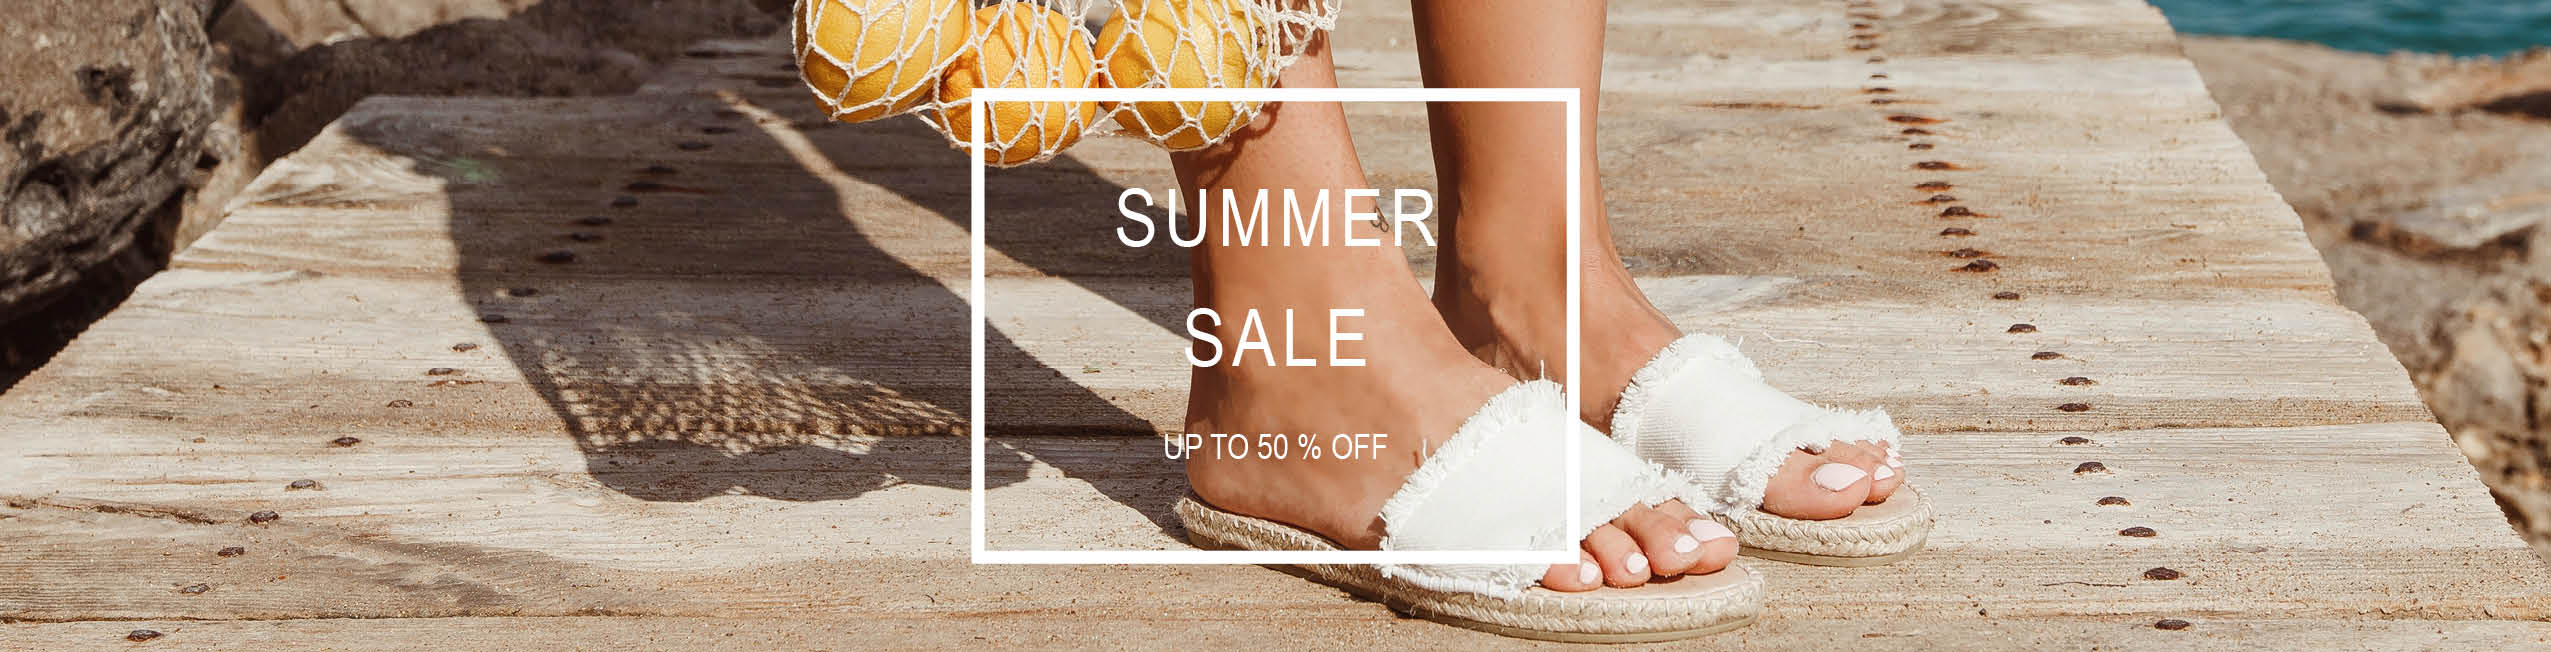 summer-sale-os-1